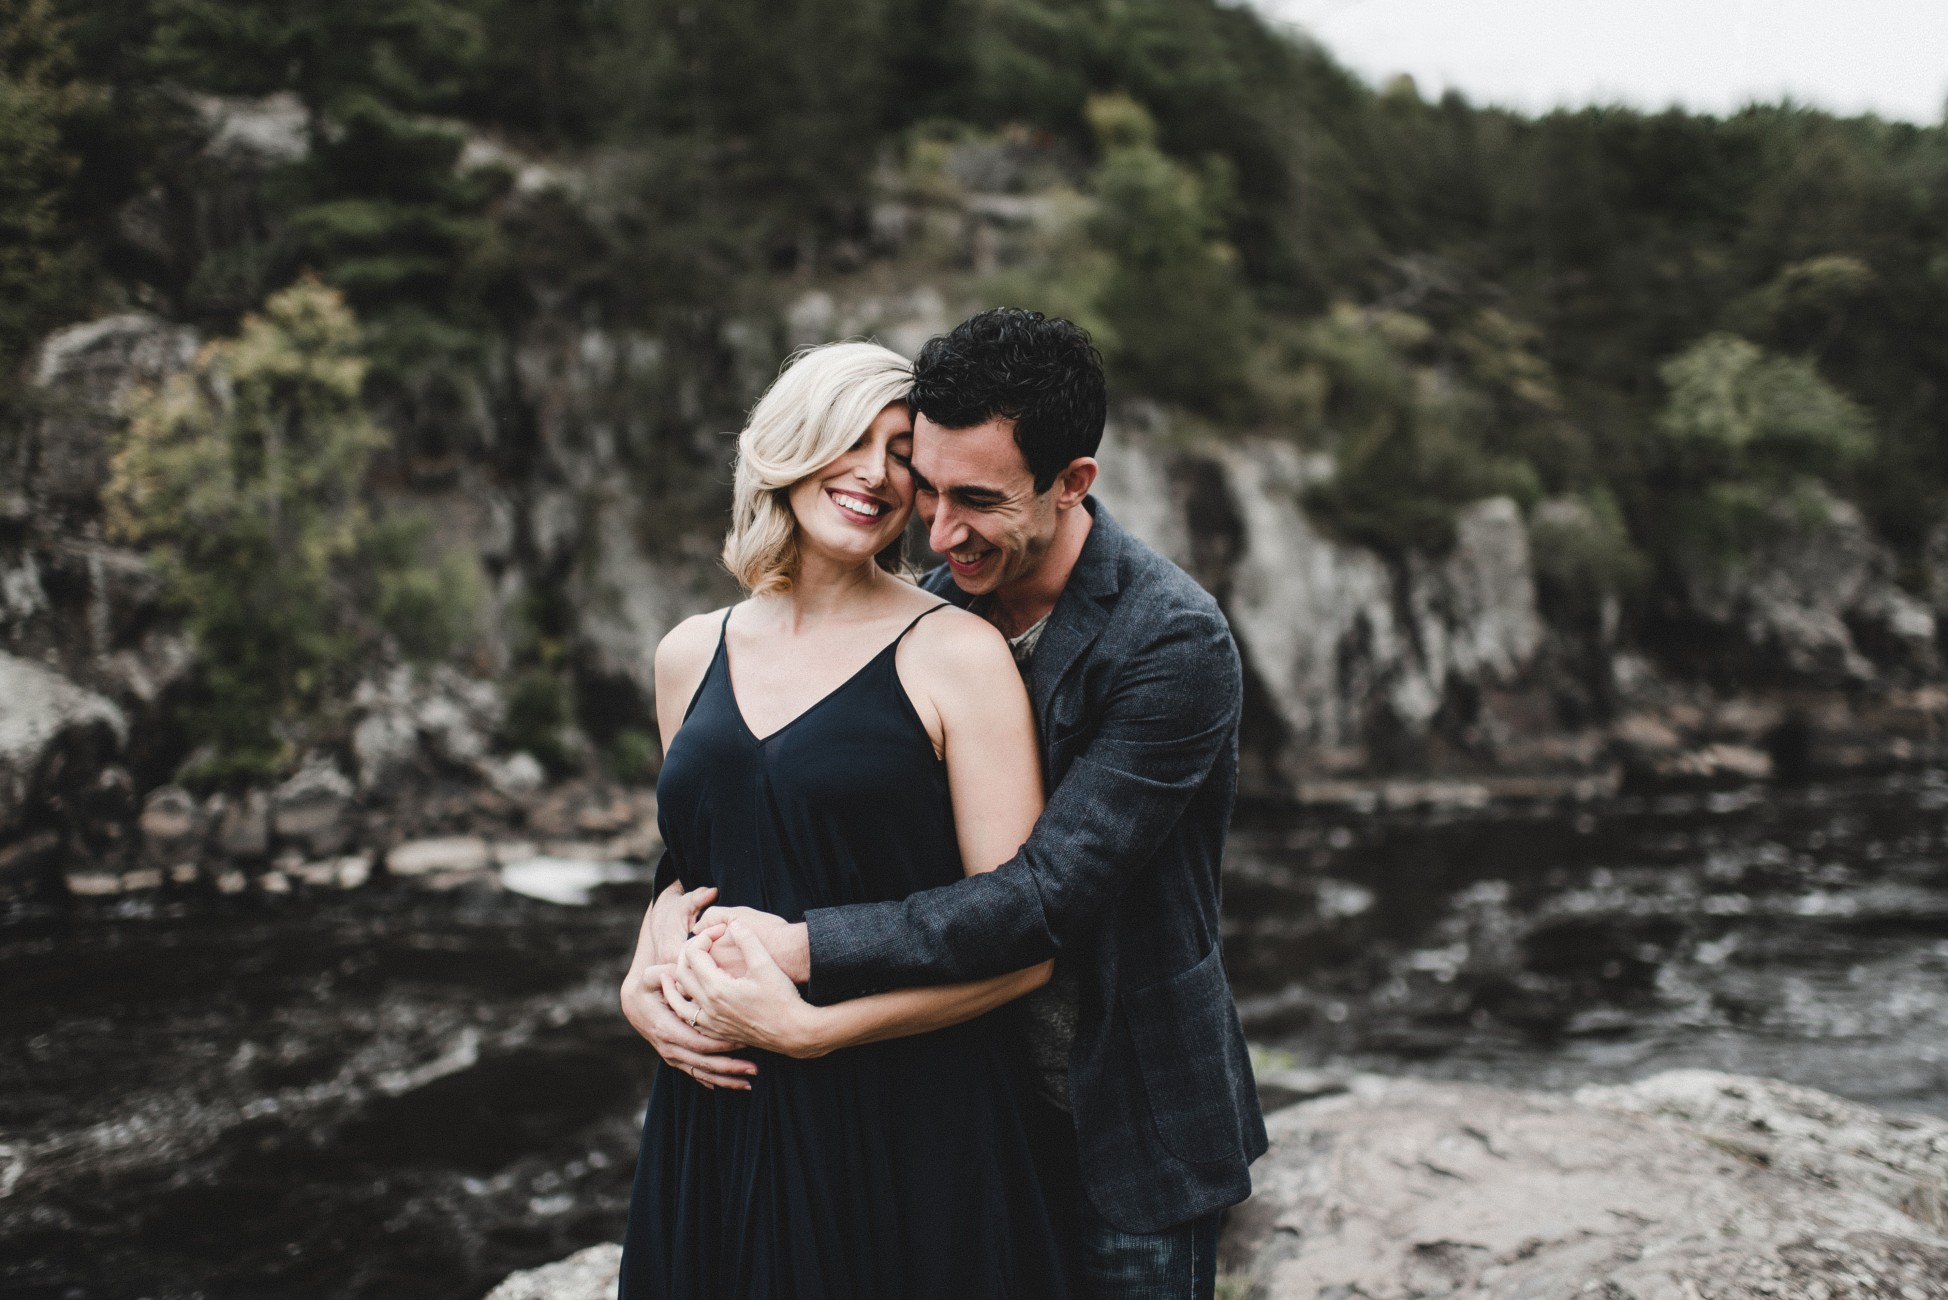 Minneapolis-Wedding-Photographers-Cadence-and-Eli-974x650@2x.jpg